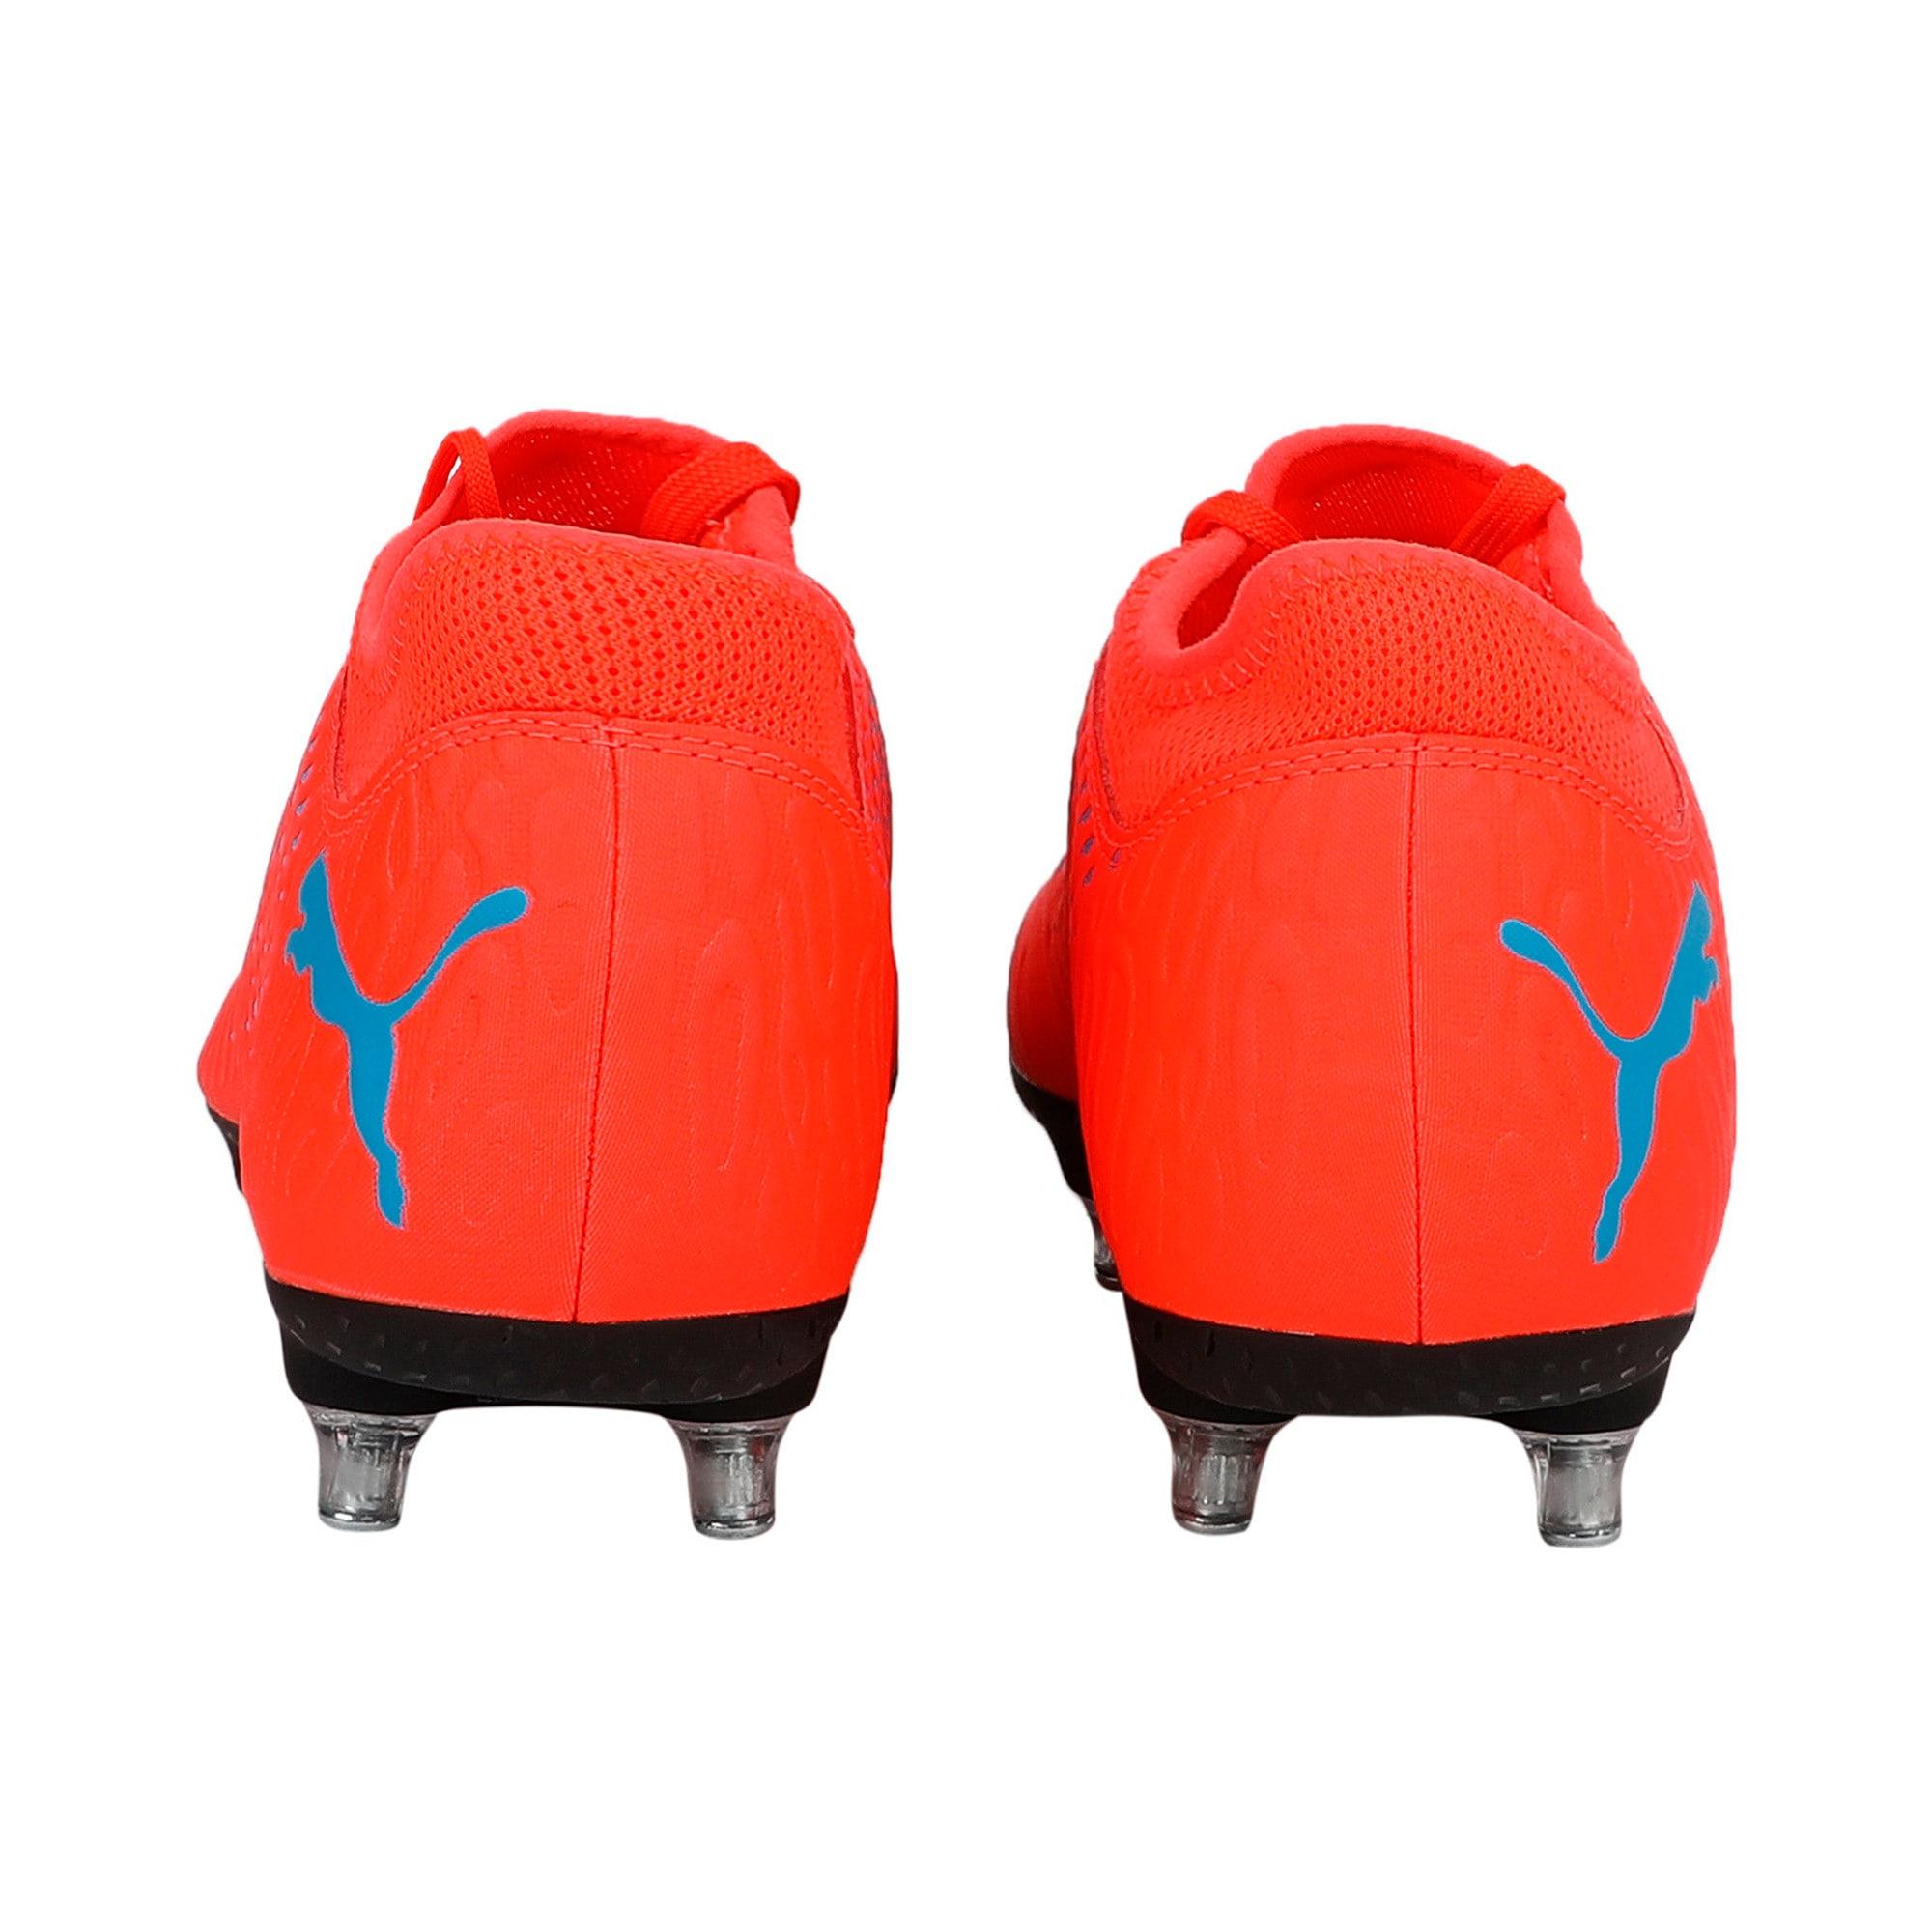 Thumbnail 3 of FUTURE 19.4 SG Men's Football Boots, Red Blast-Bleu Azur, medium-IND